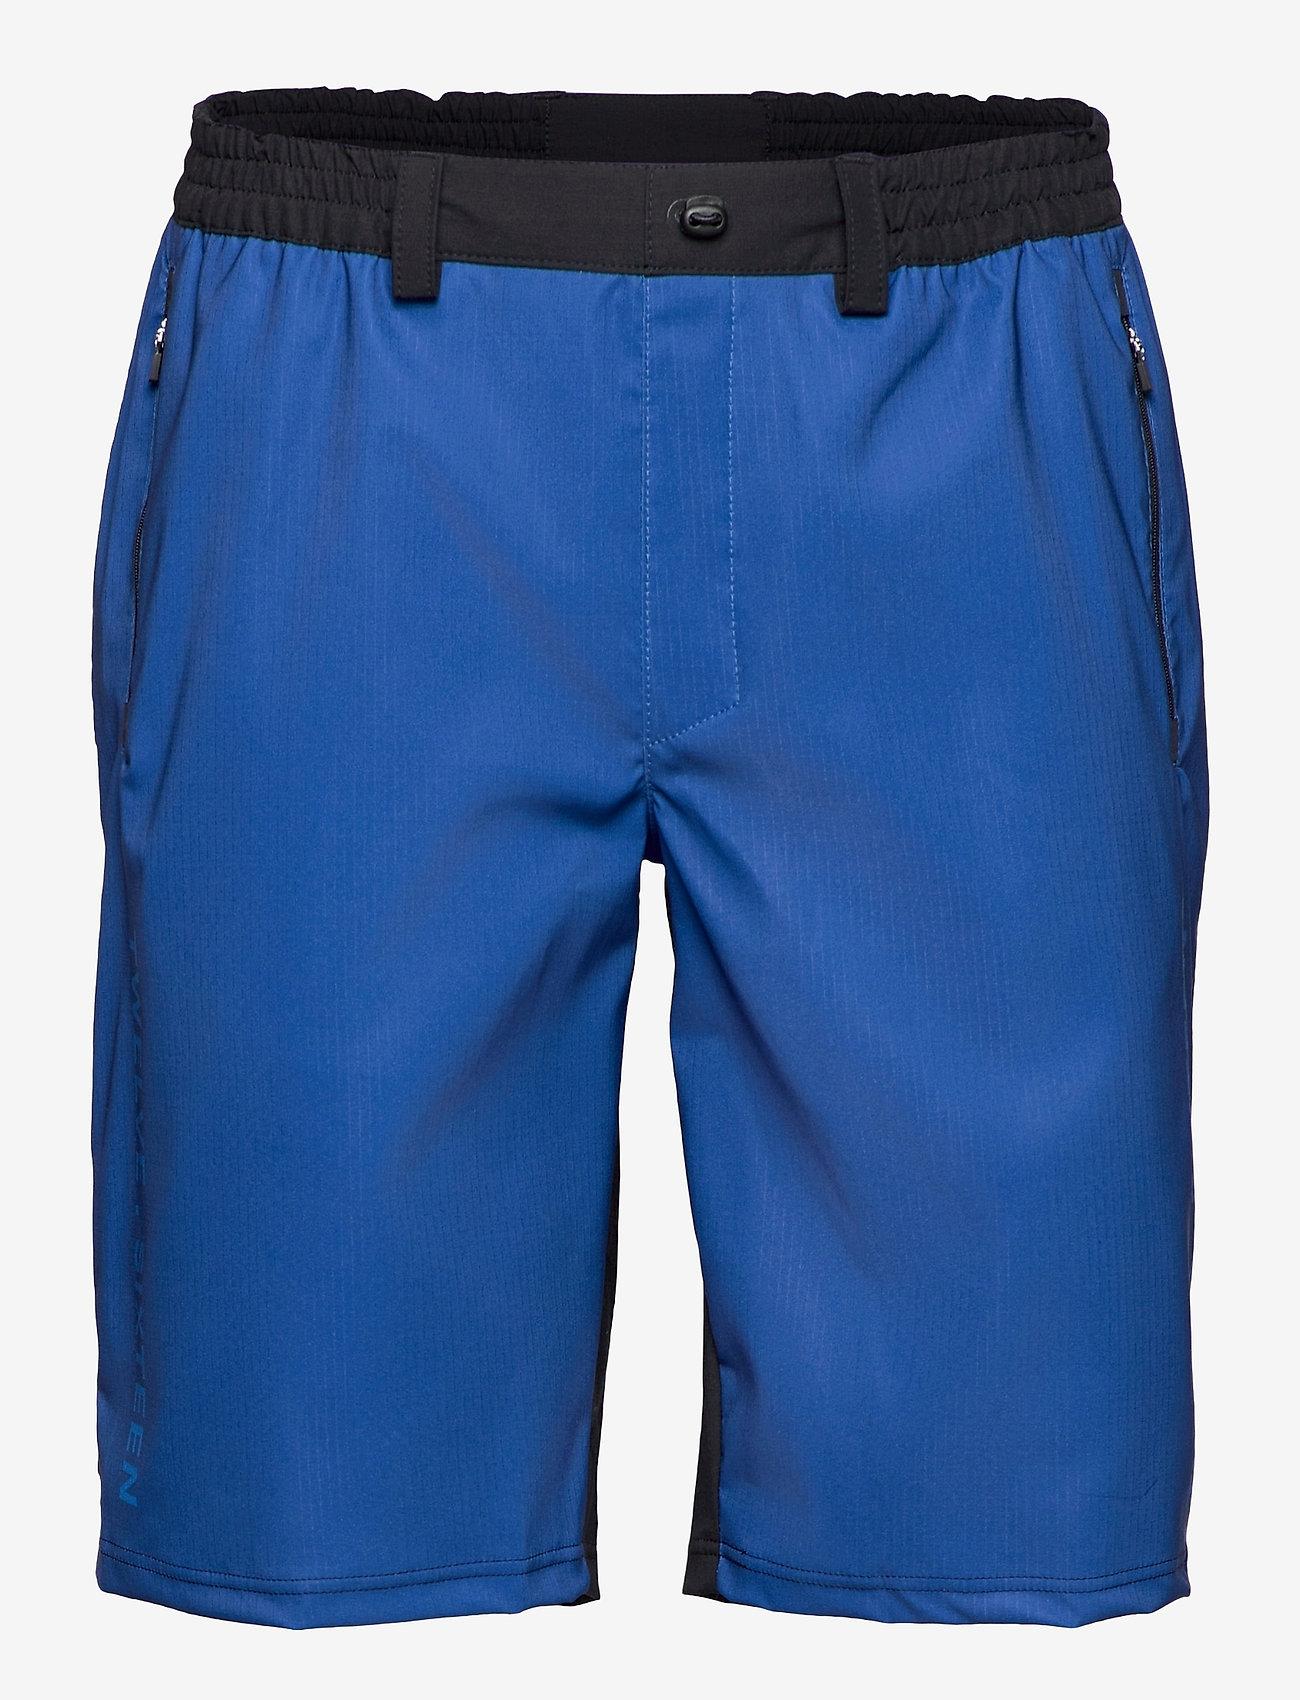 Twelve Sixteen - Shorts biker 17 Men - cycling shorts & tights - blue - 0